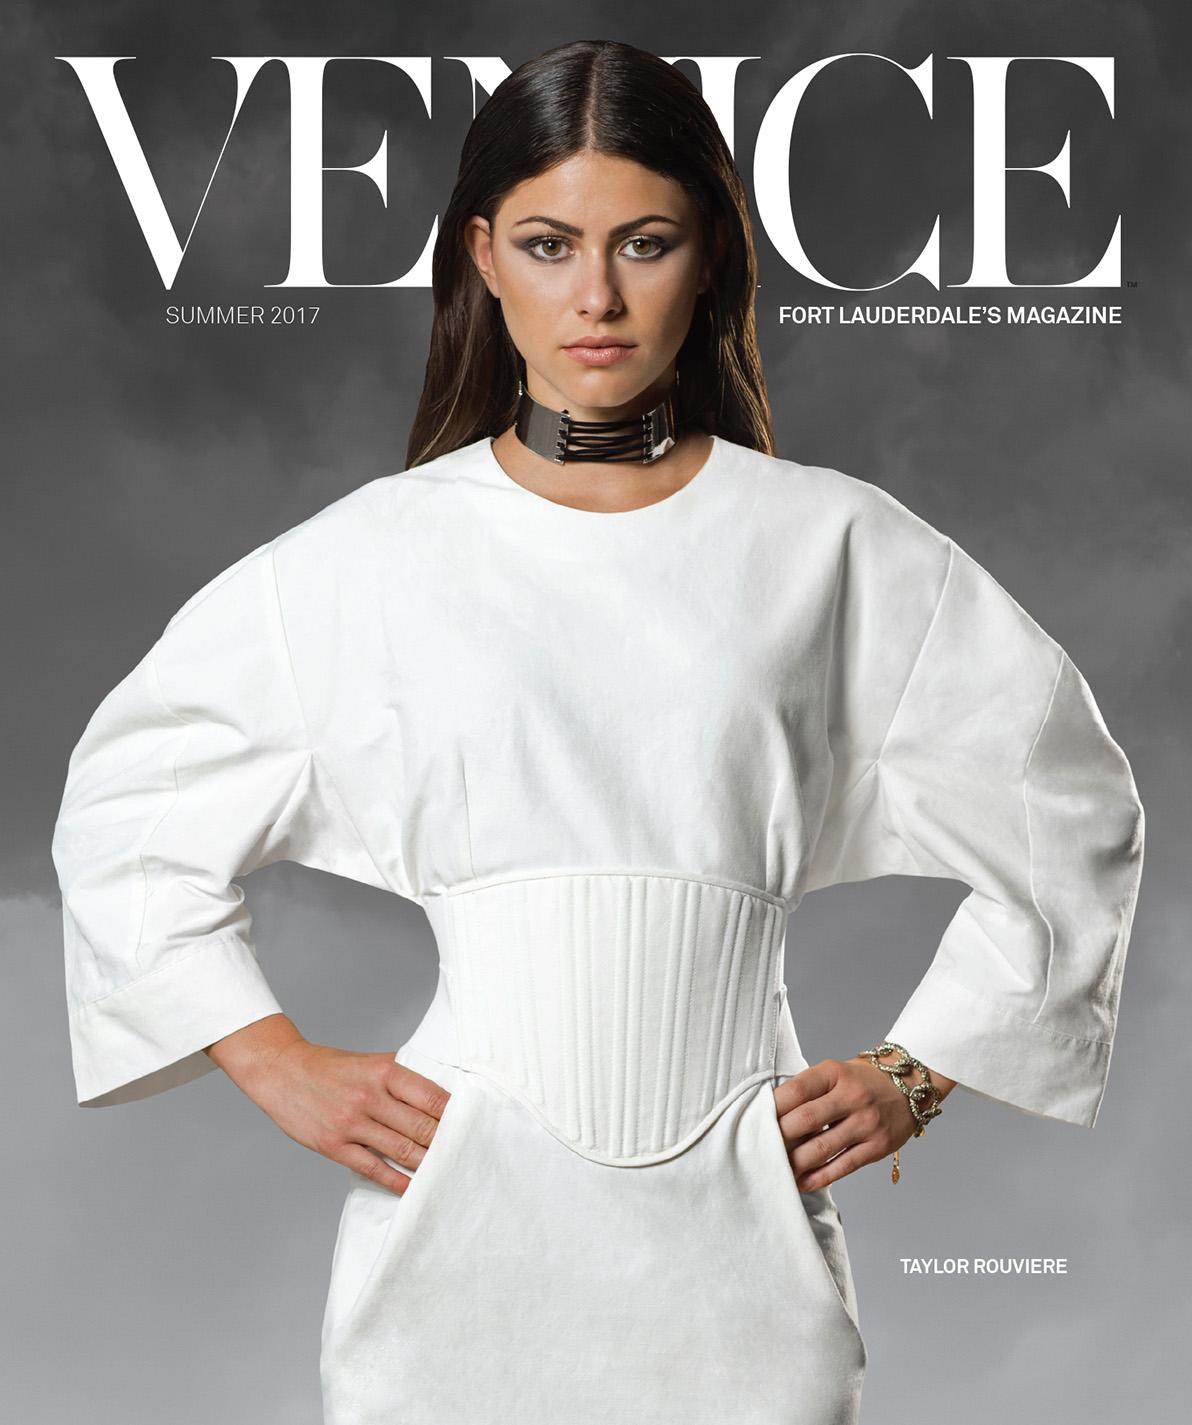 Taylor-Rouviere-Douglas-Mott-Venice-magazine-miami-fort-lauderdale-stella-mccartney-bloodline